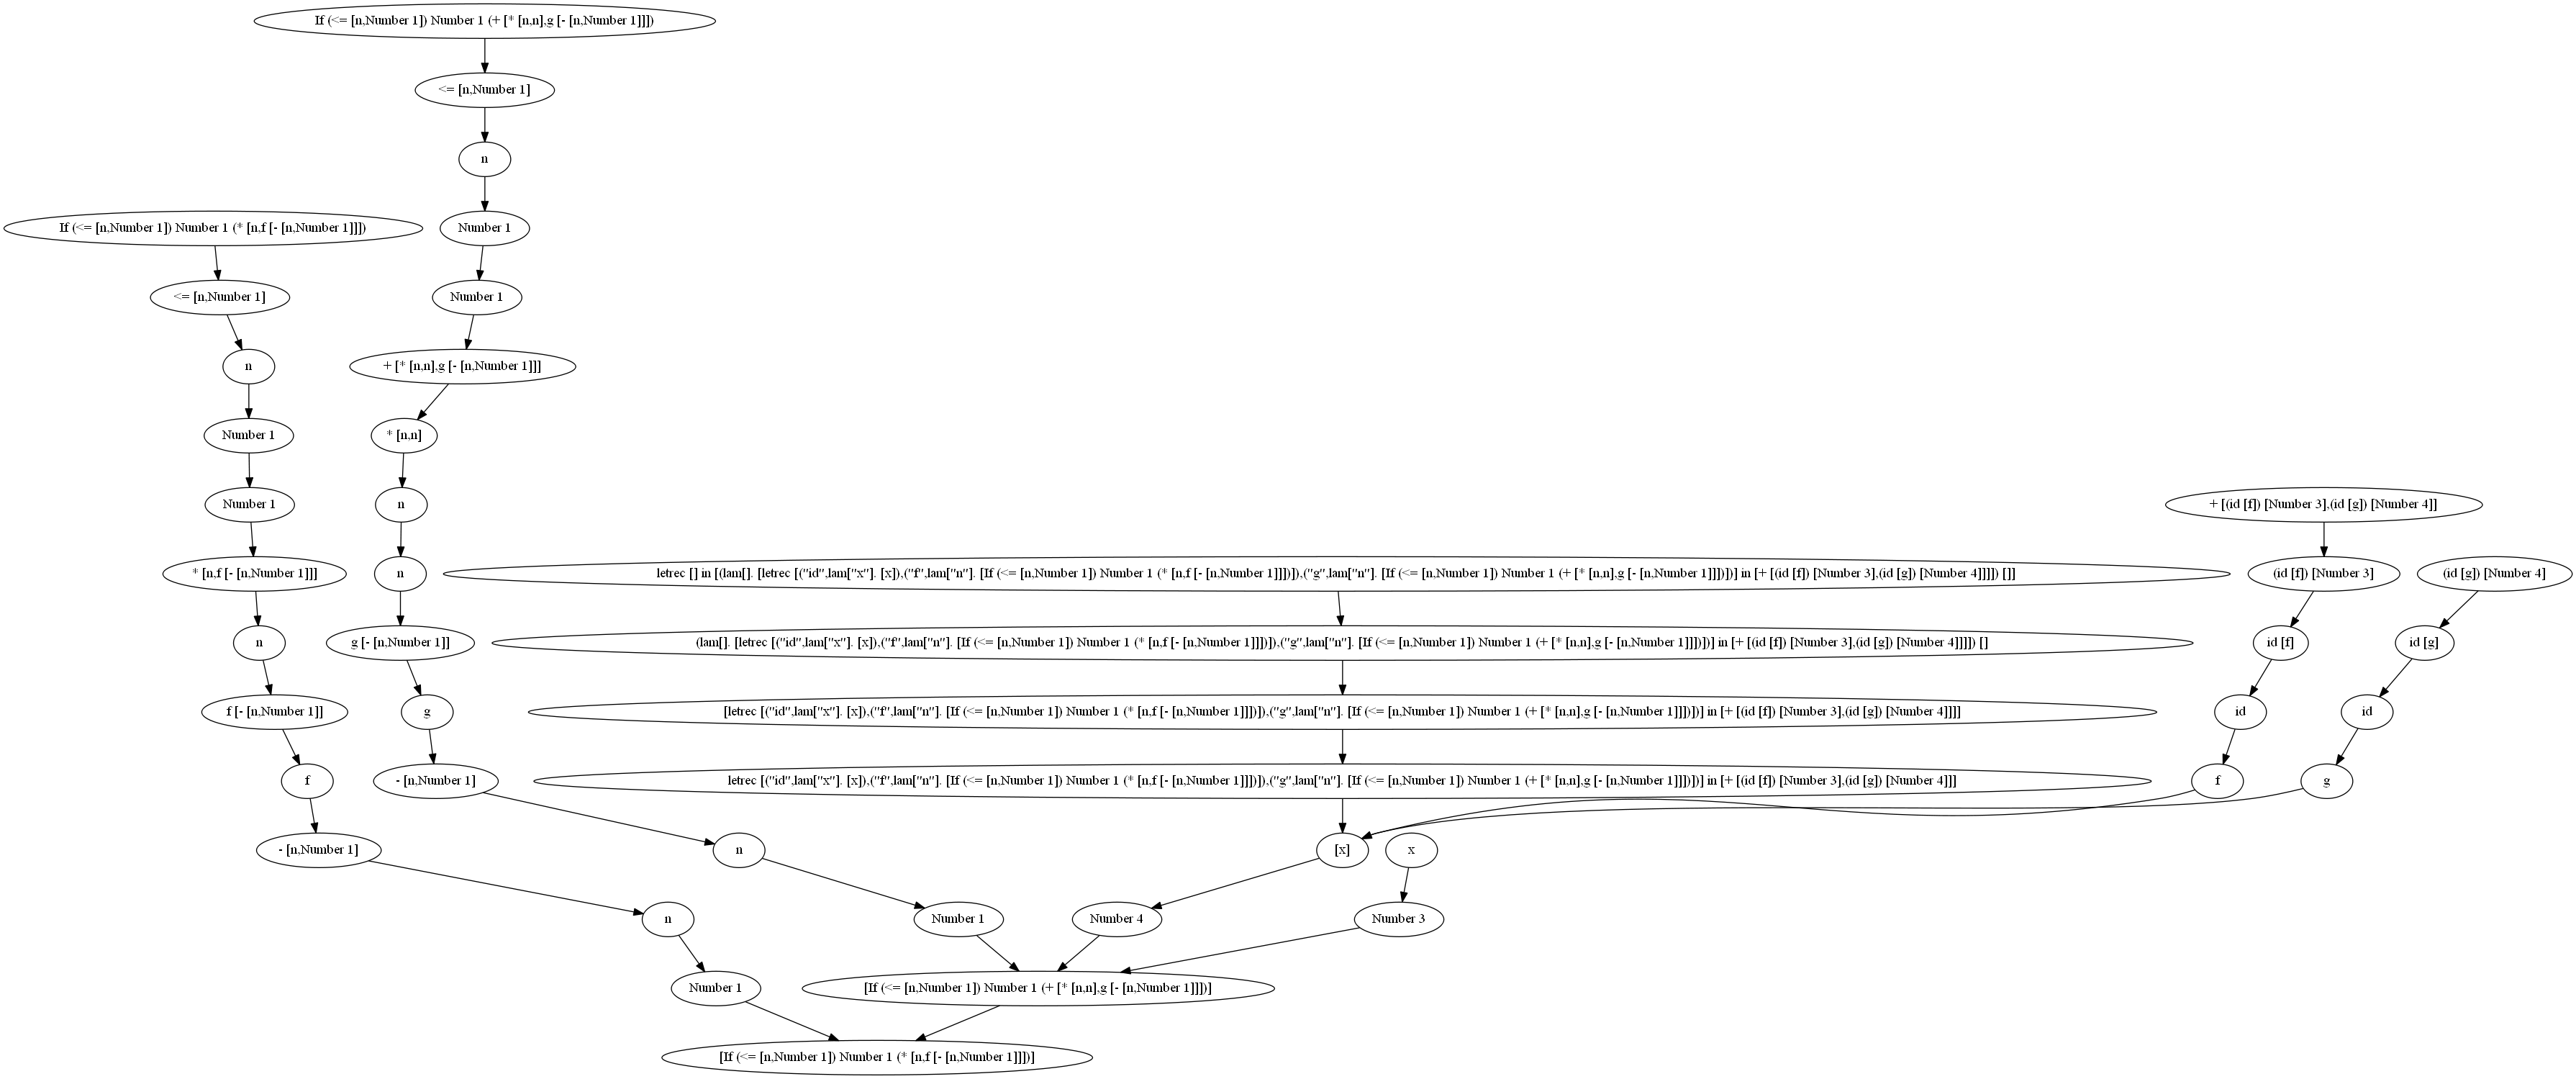 scheme/graph_files/scala-am/gcipd.png